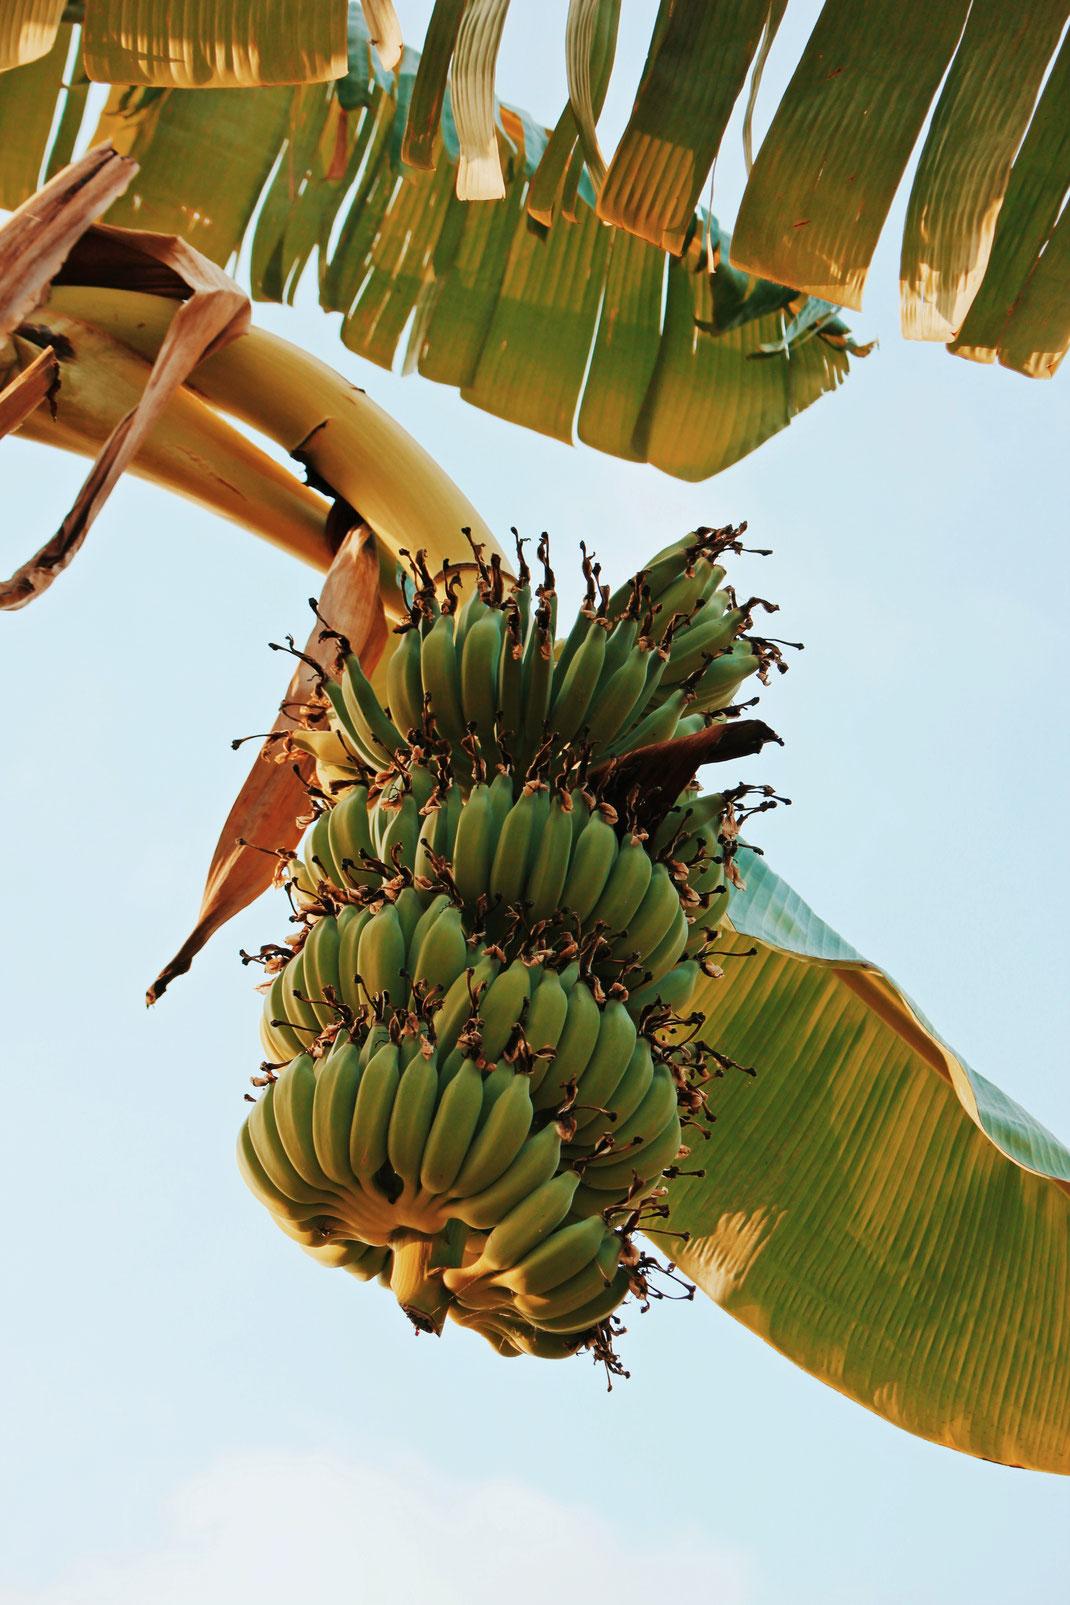 Majestic banana plant at Luam's garden at Koh Yao Noi Island, Thailand